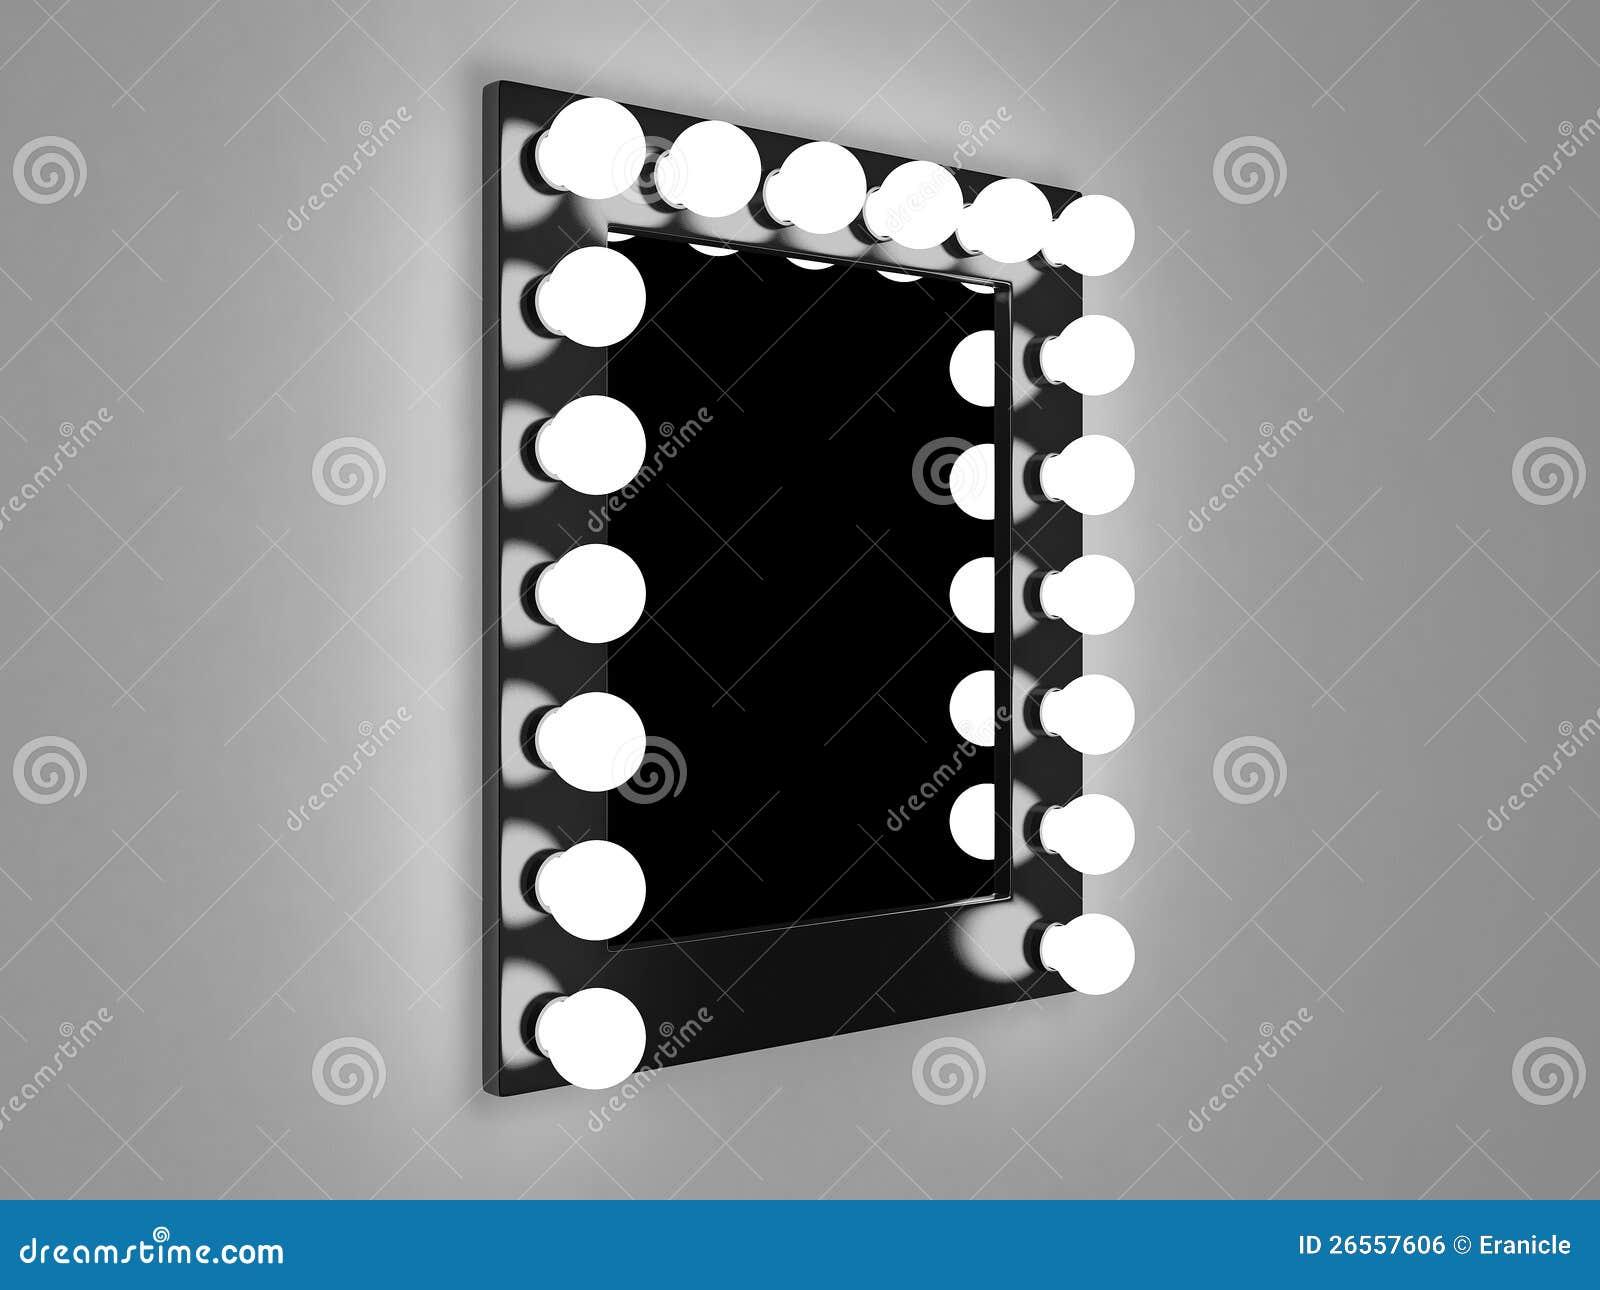 Makeup mirror stock illustration. Image of wall, illuminated - 26557606